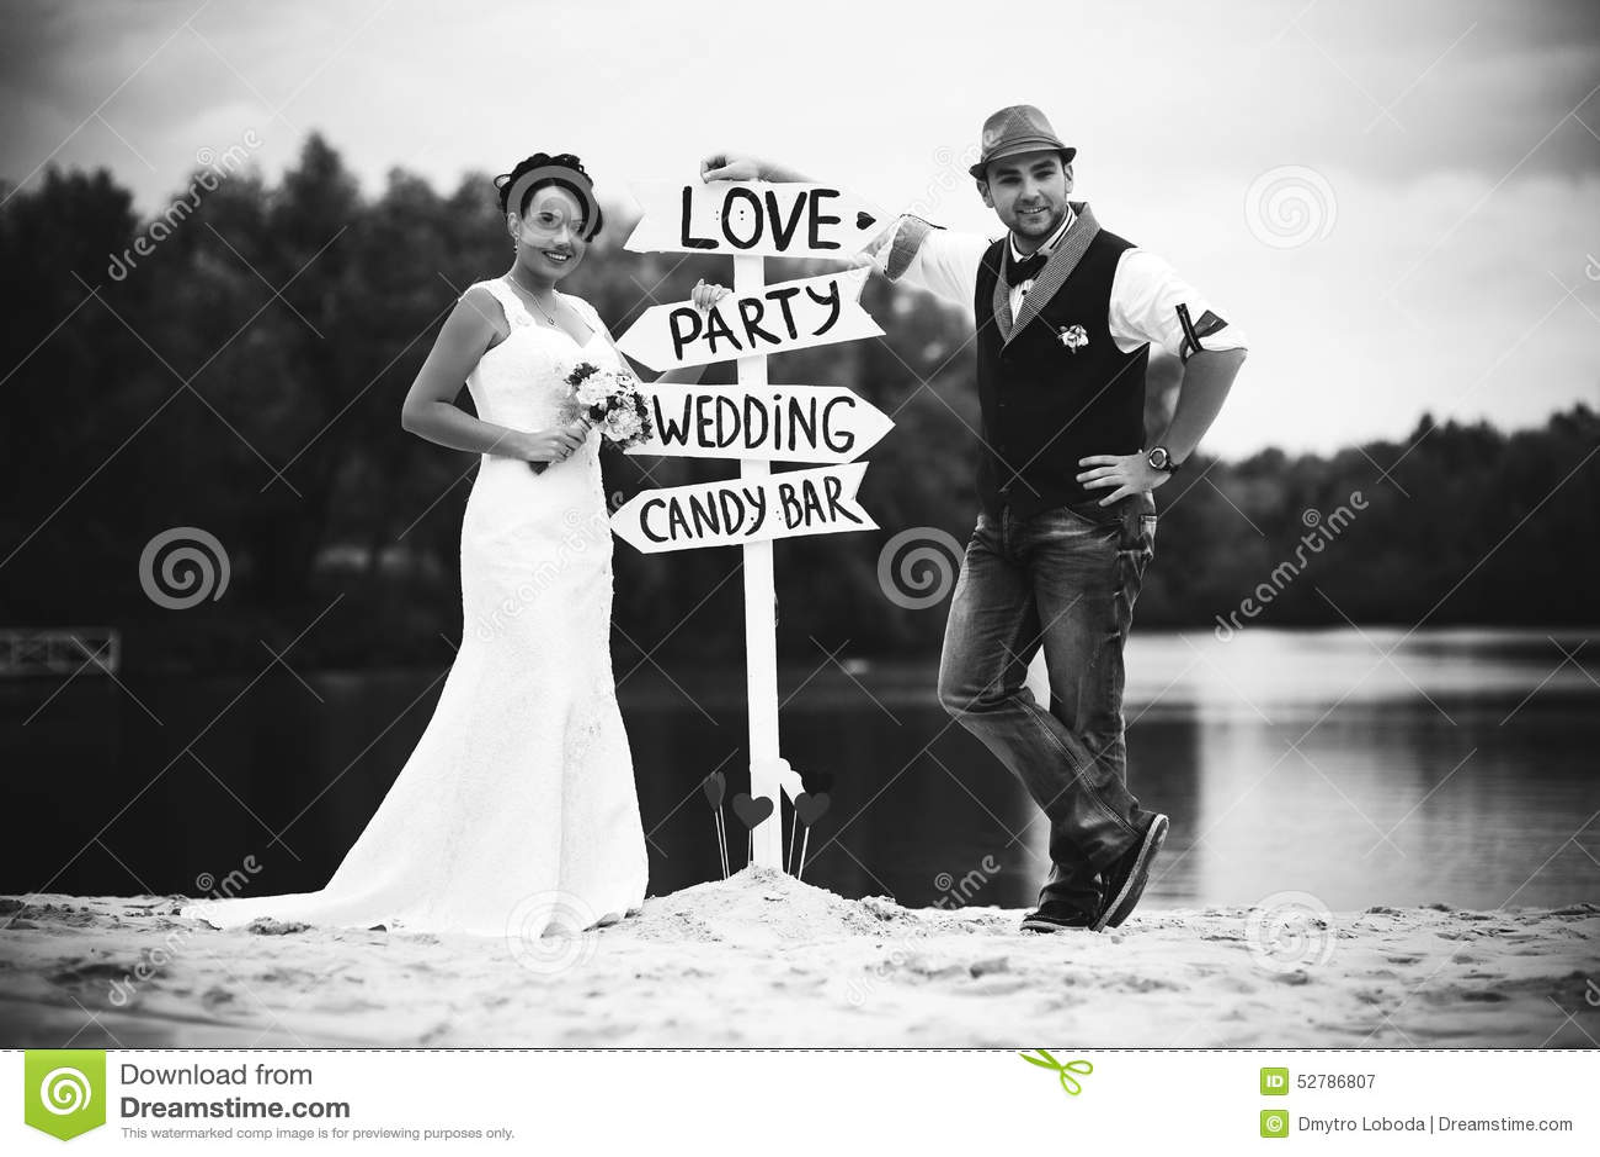 Etiqueta do casamento